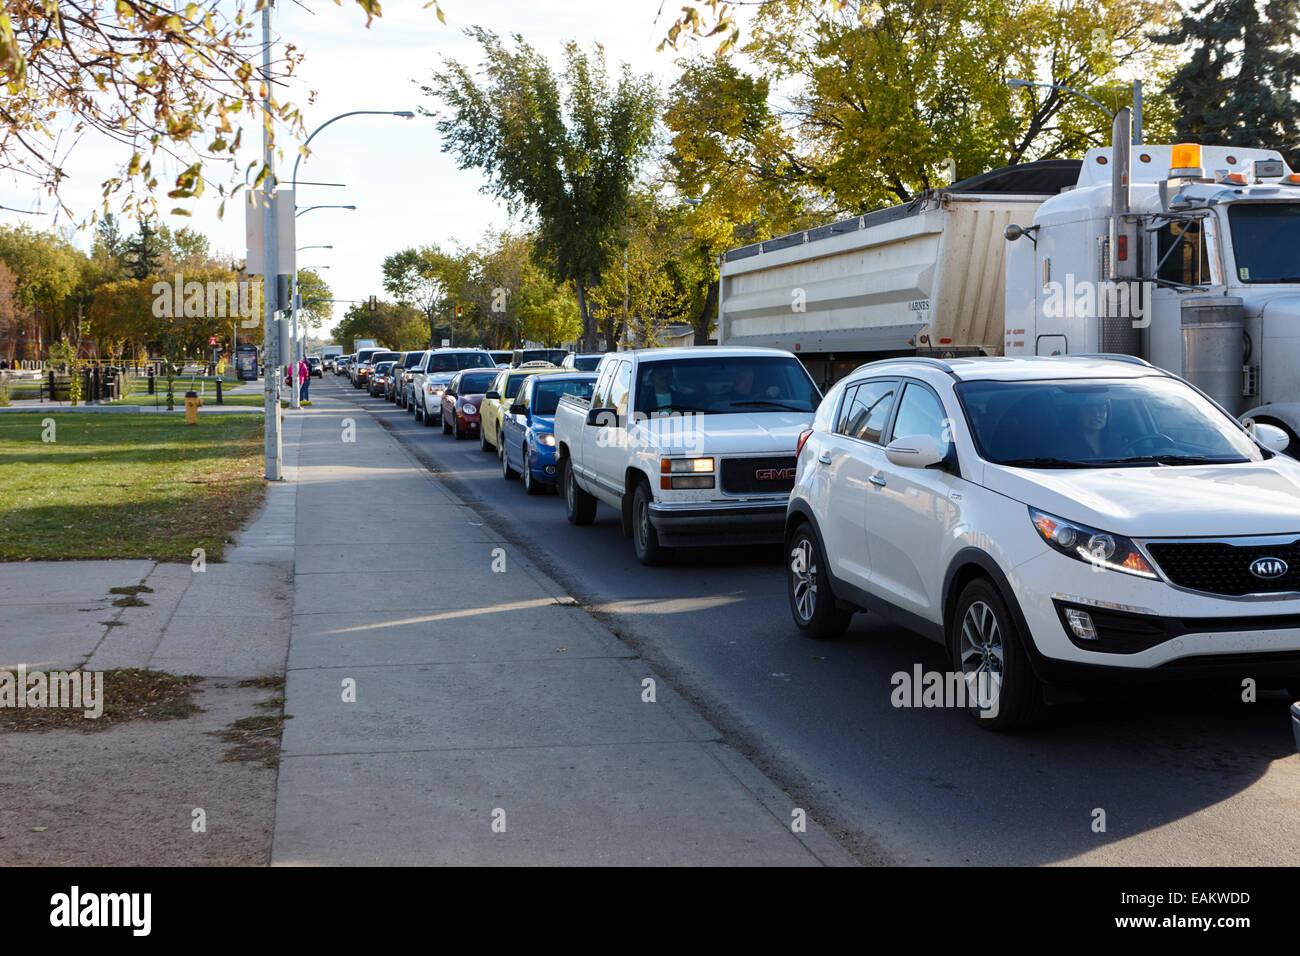 traffic building up in street at rush hour saskatoon Saskatchewan Canada - Stock Image